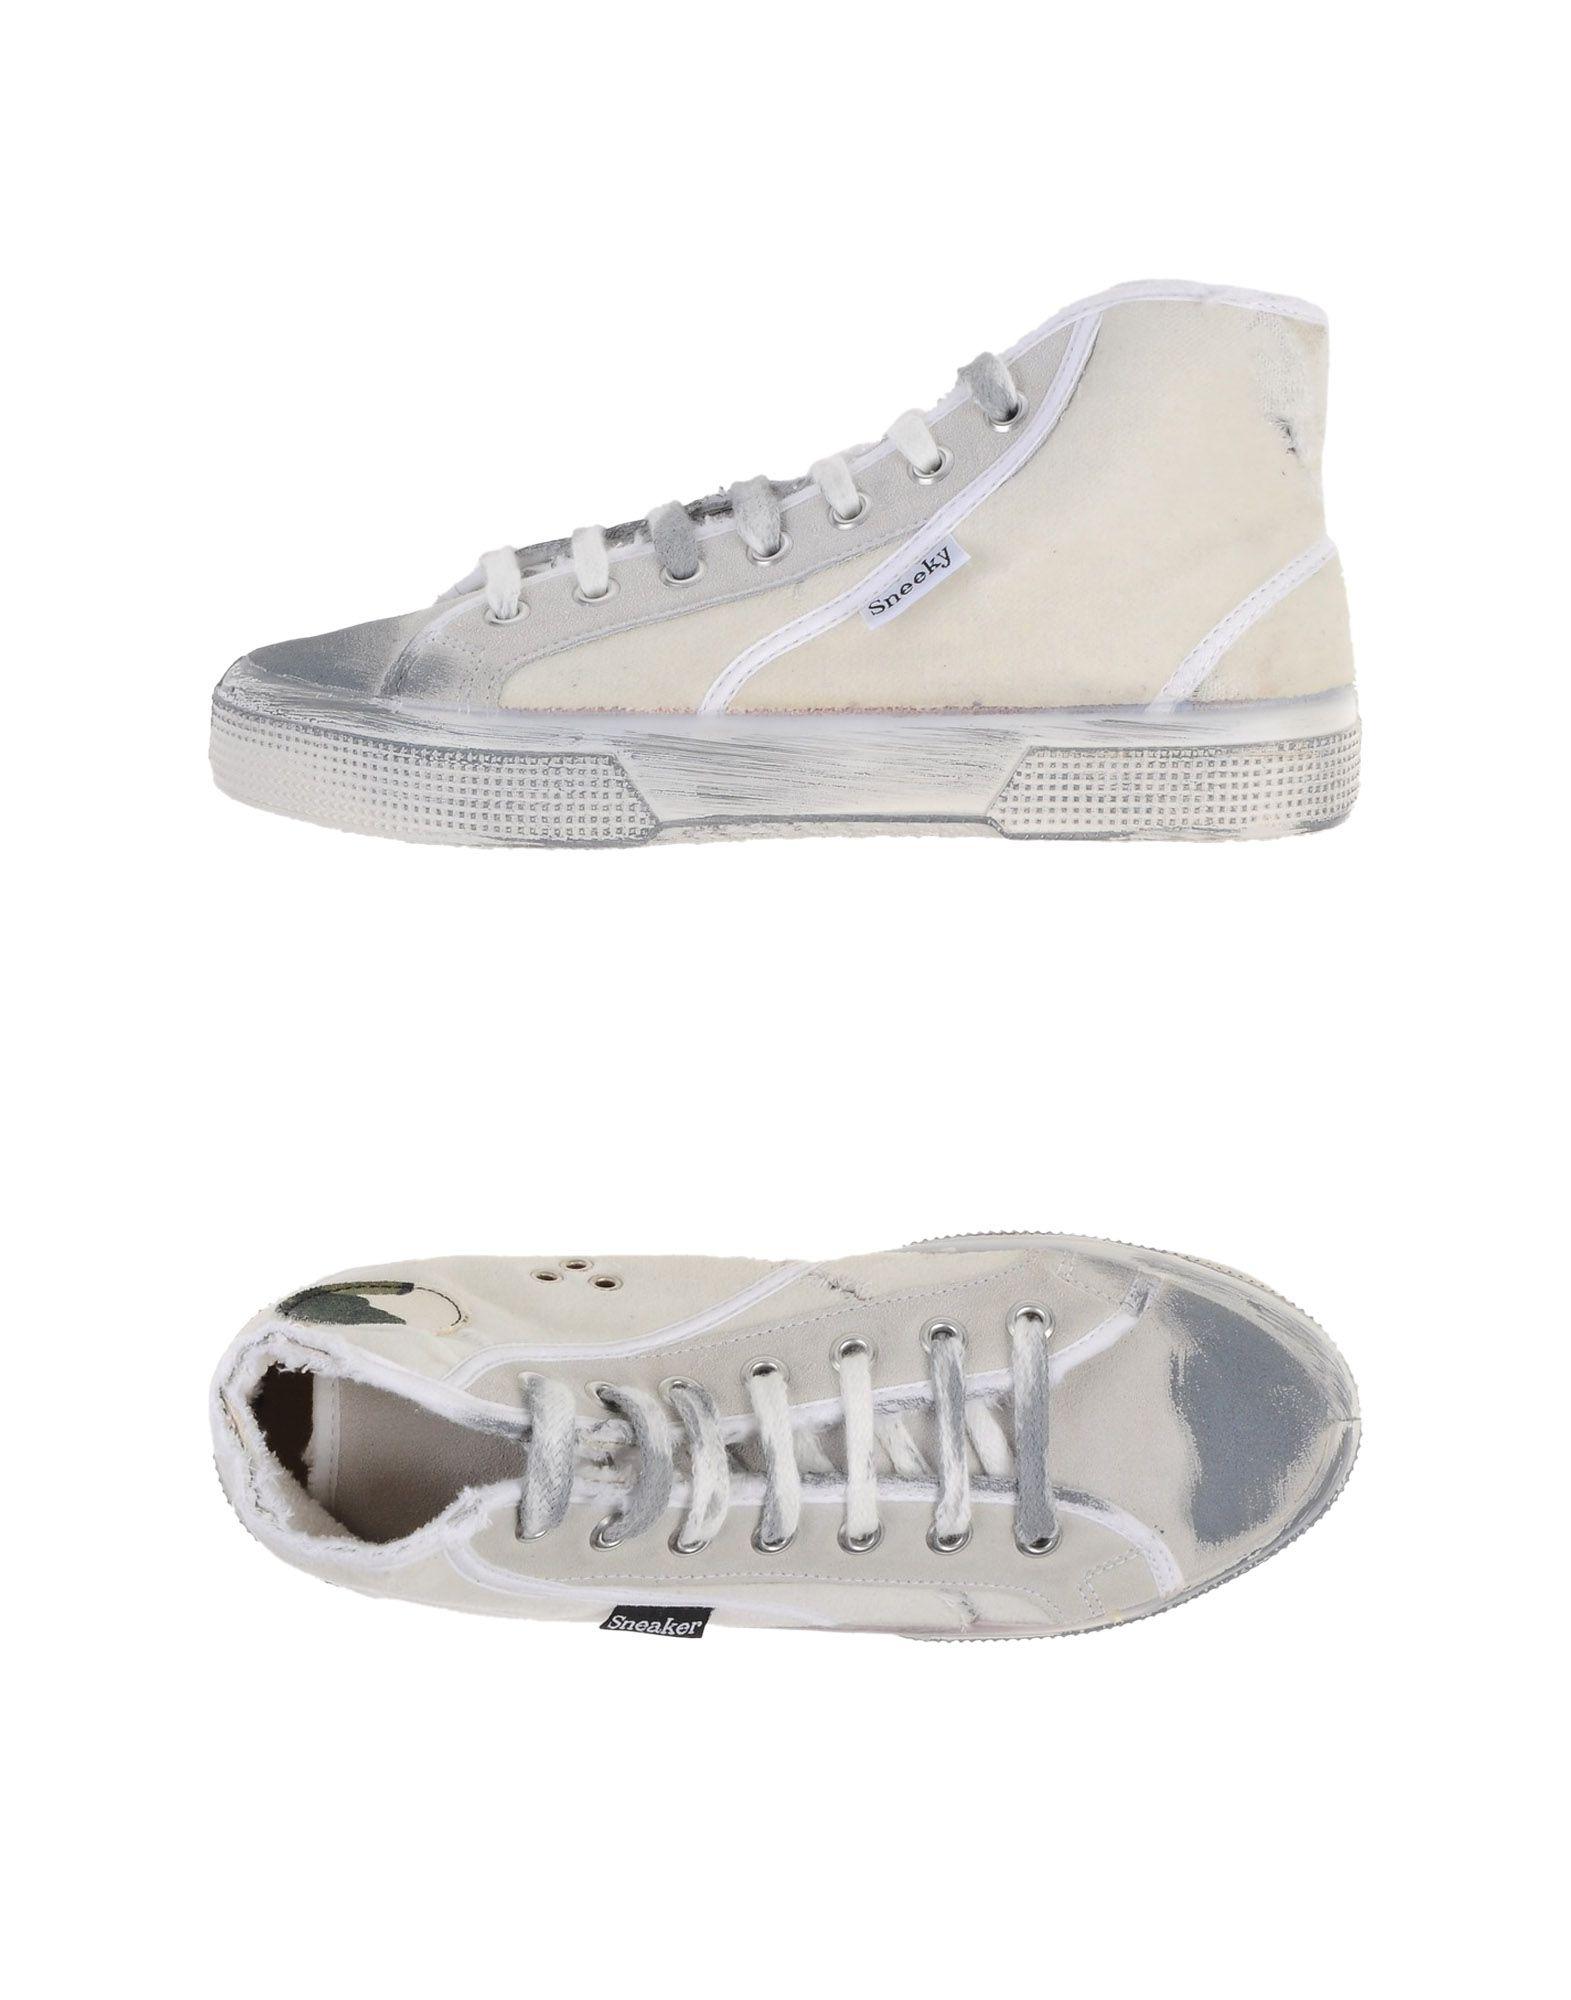 Sneeky TurnschuheSneakers Damen Damen TurnschuheSneakers  44815856RN  ac9688